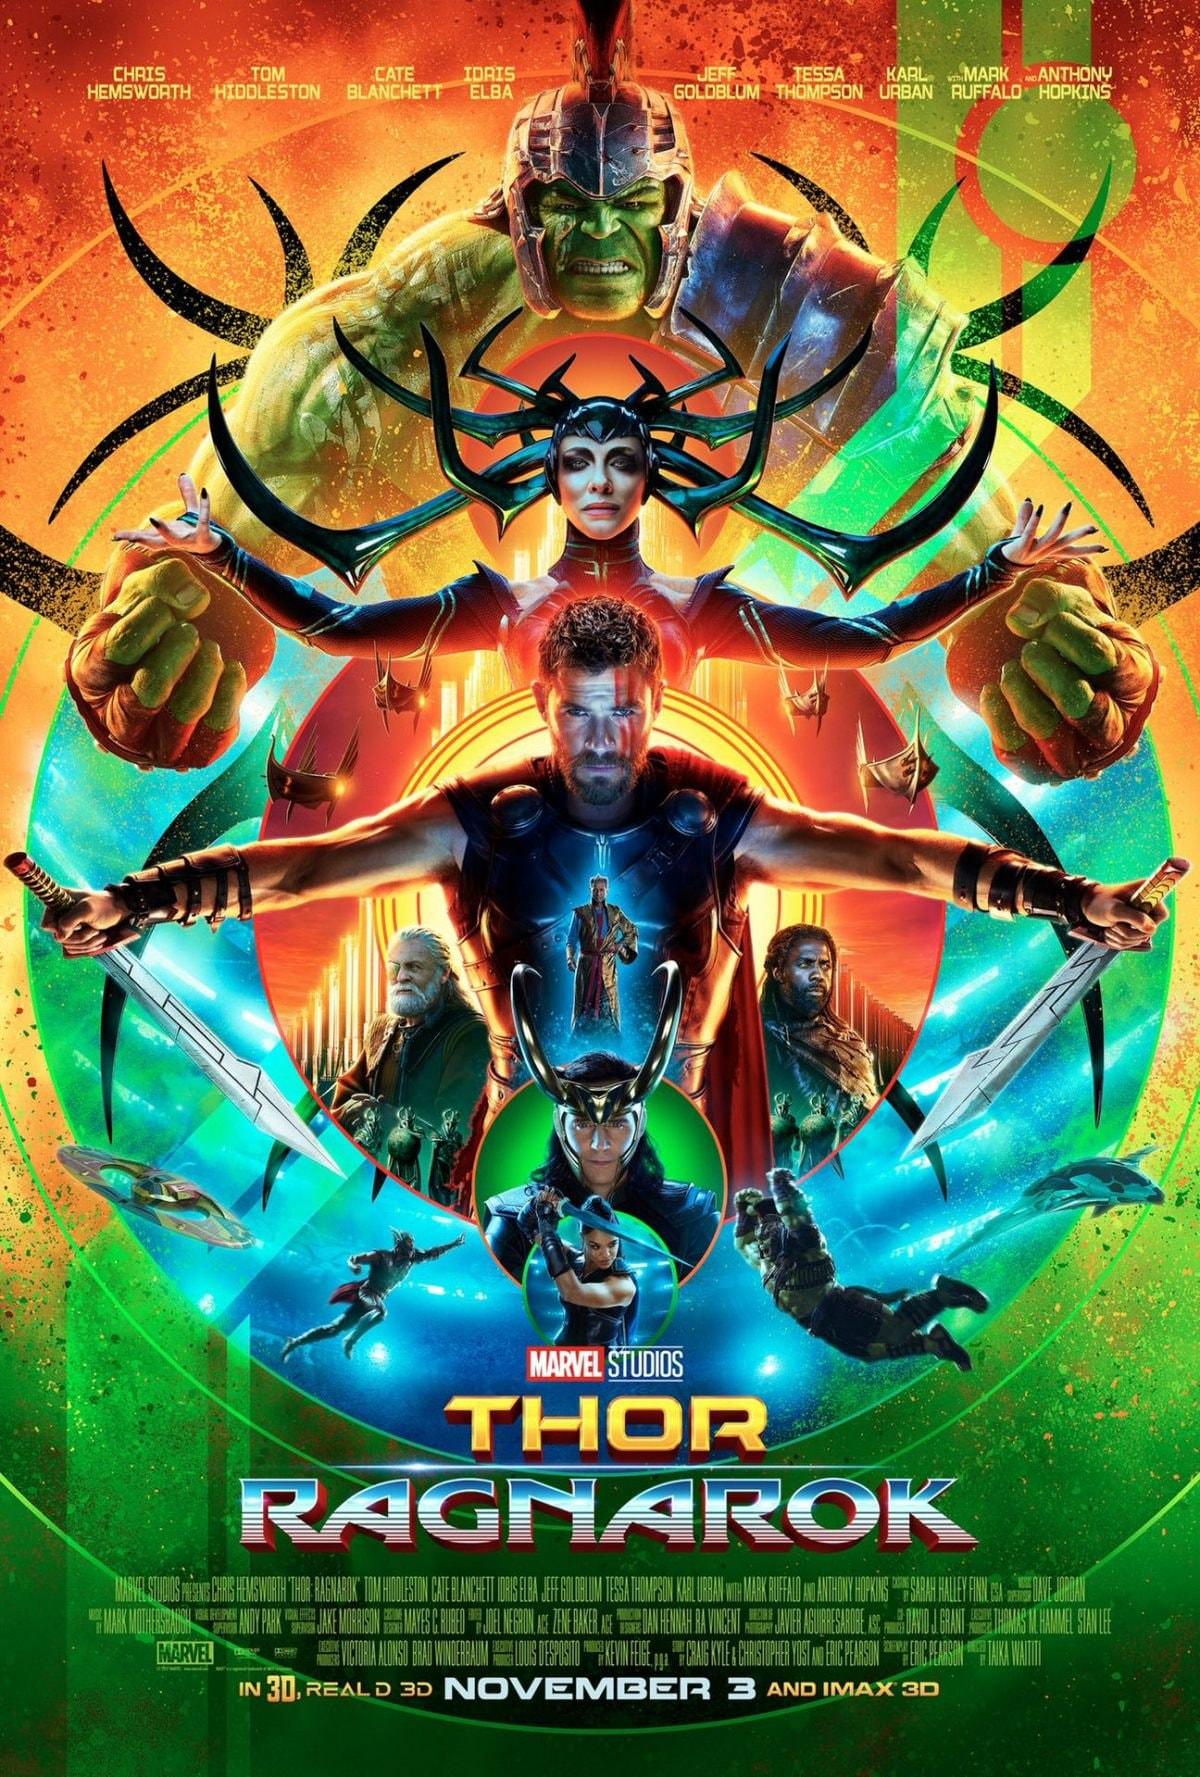 《Thor: Ragnarok》釋出最新宣傳海報 同時公佈此片將創 MCU 系列最短片長